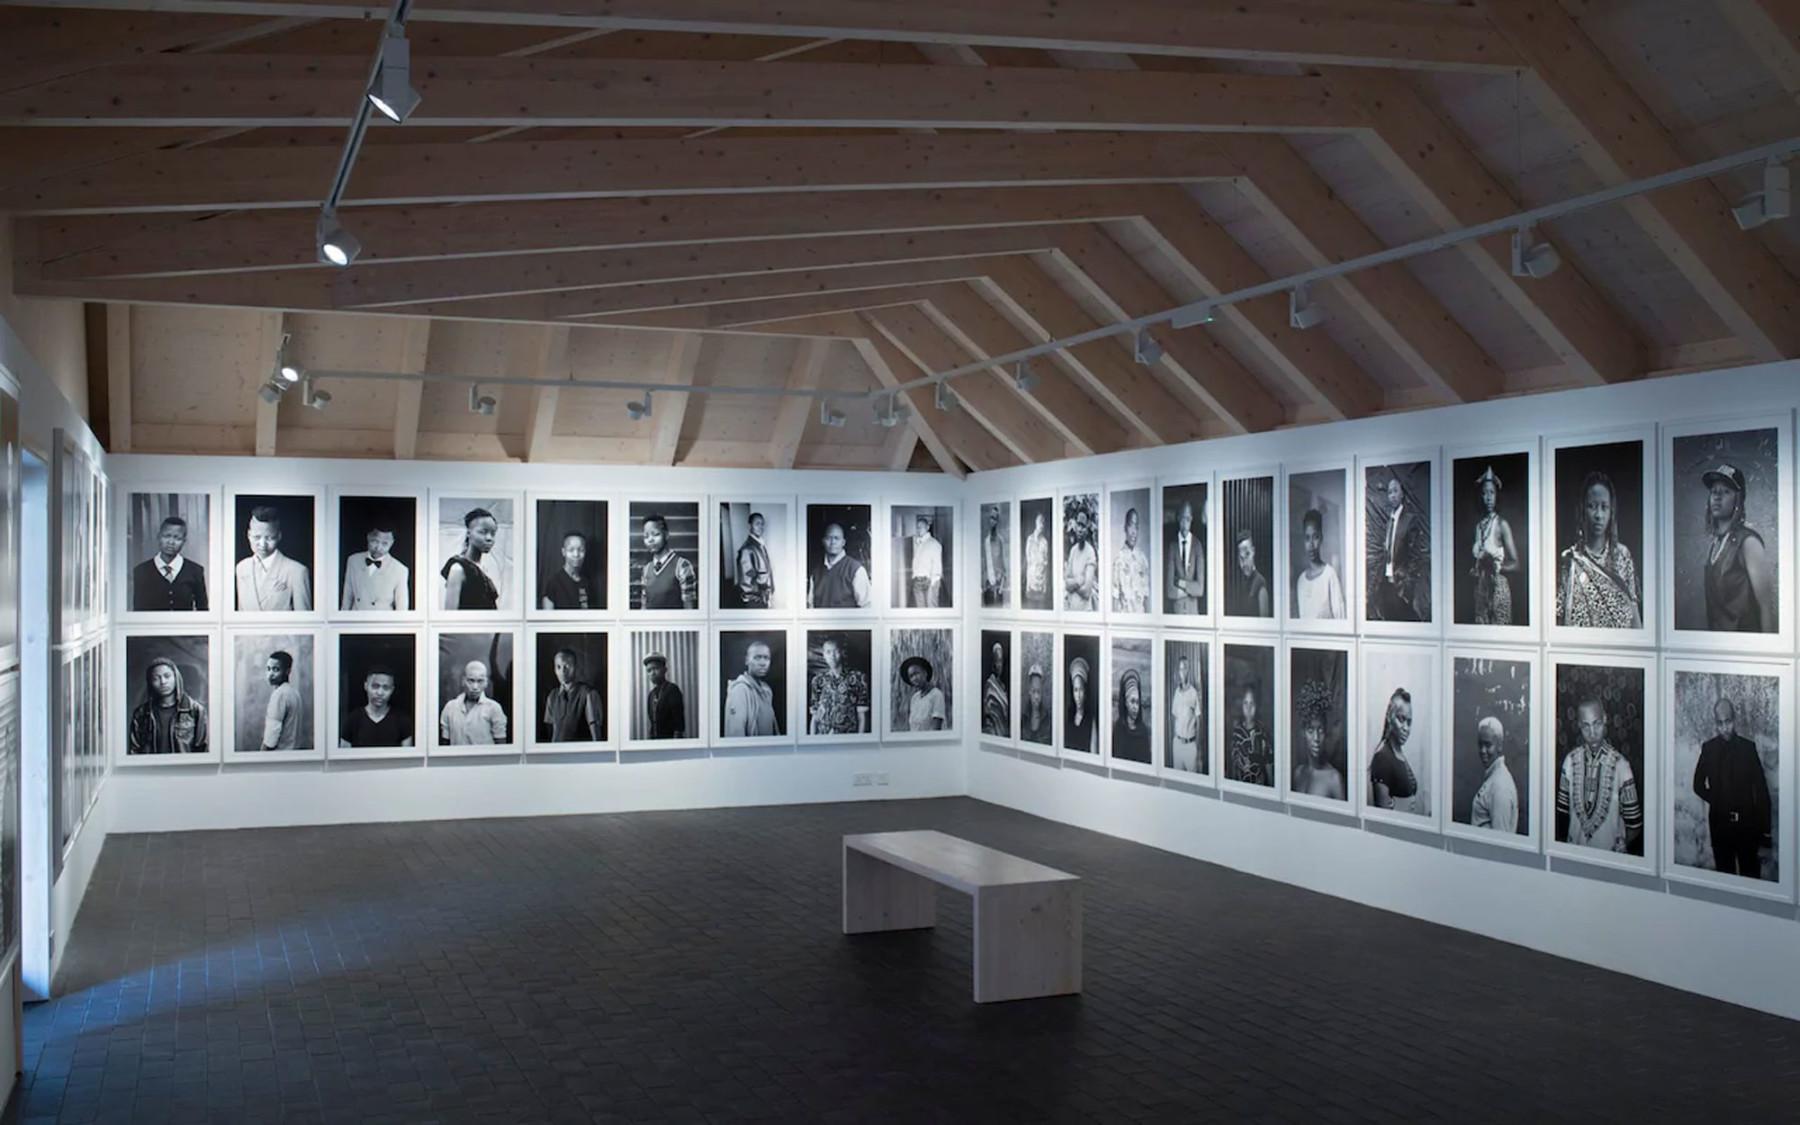 Charleston-trust-jamie-fobert-architects-gallery-museum-quarry-tile